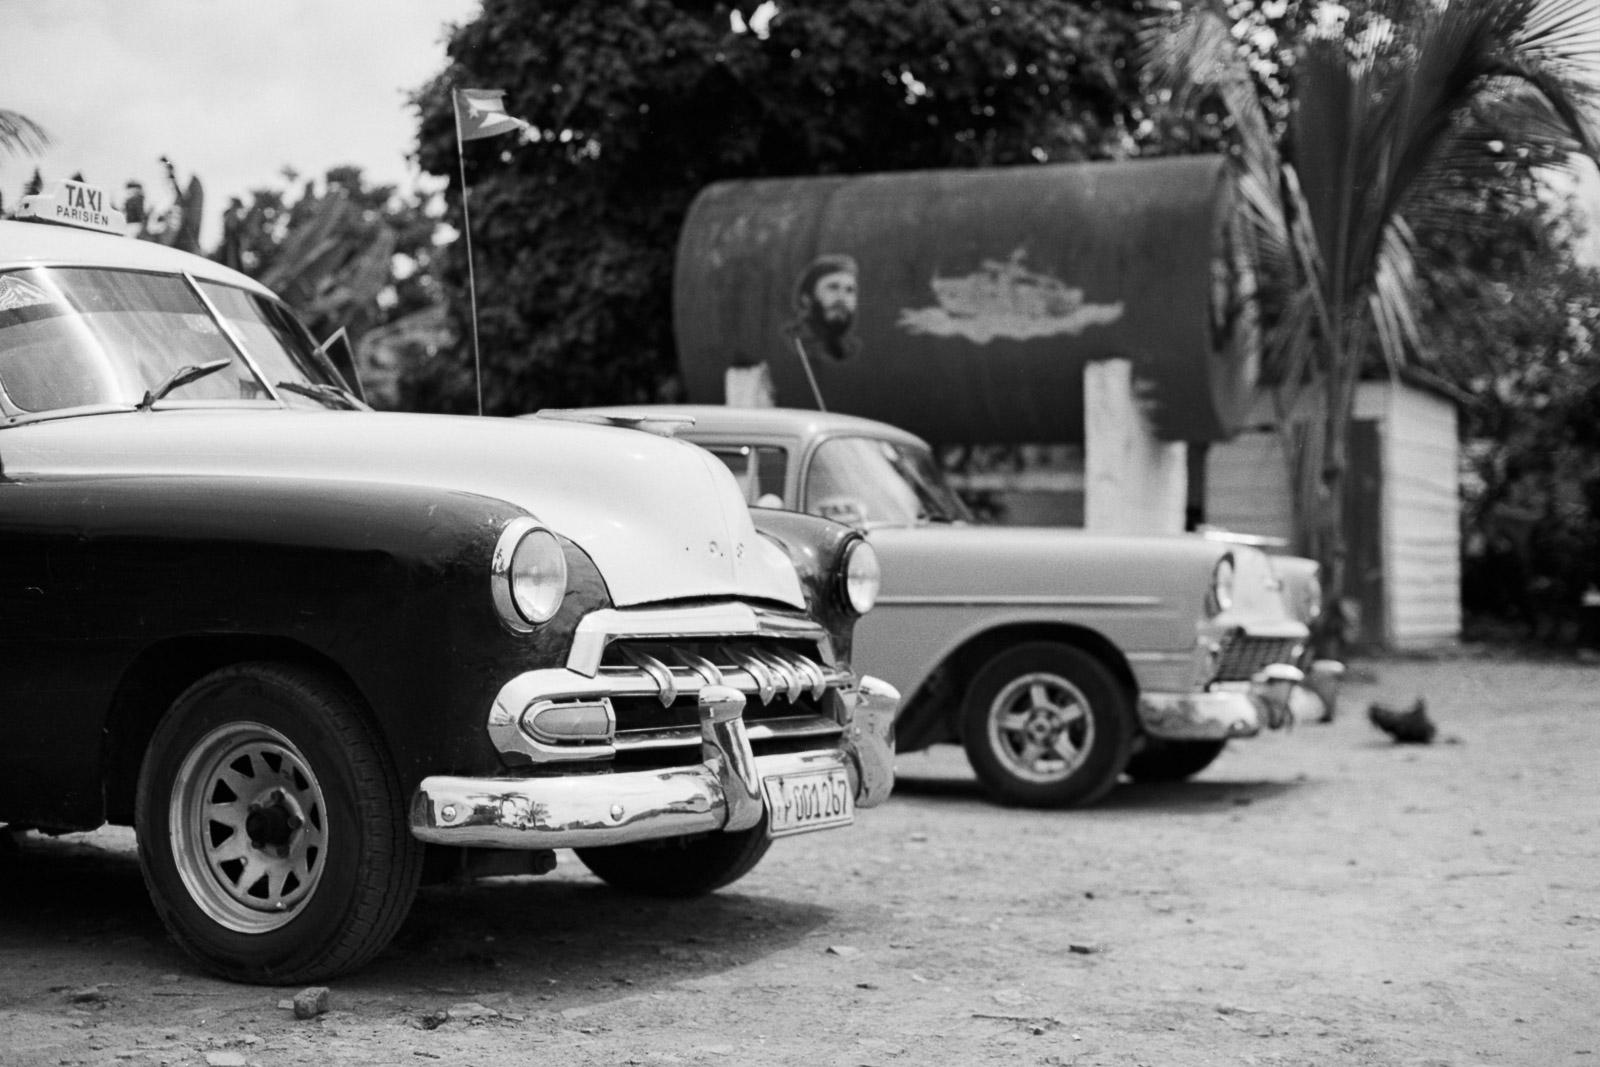 0001-cuba-travelphotography-12-cuba-portra-160-31.jpg